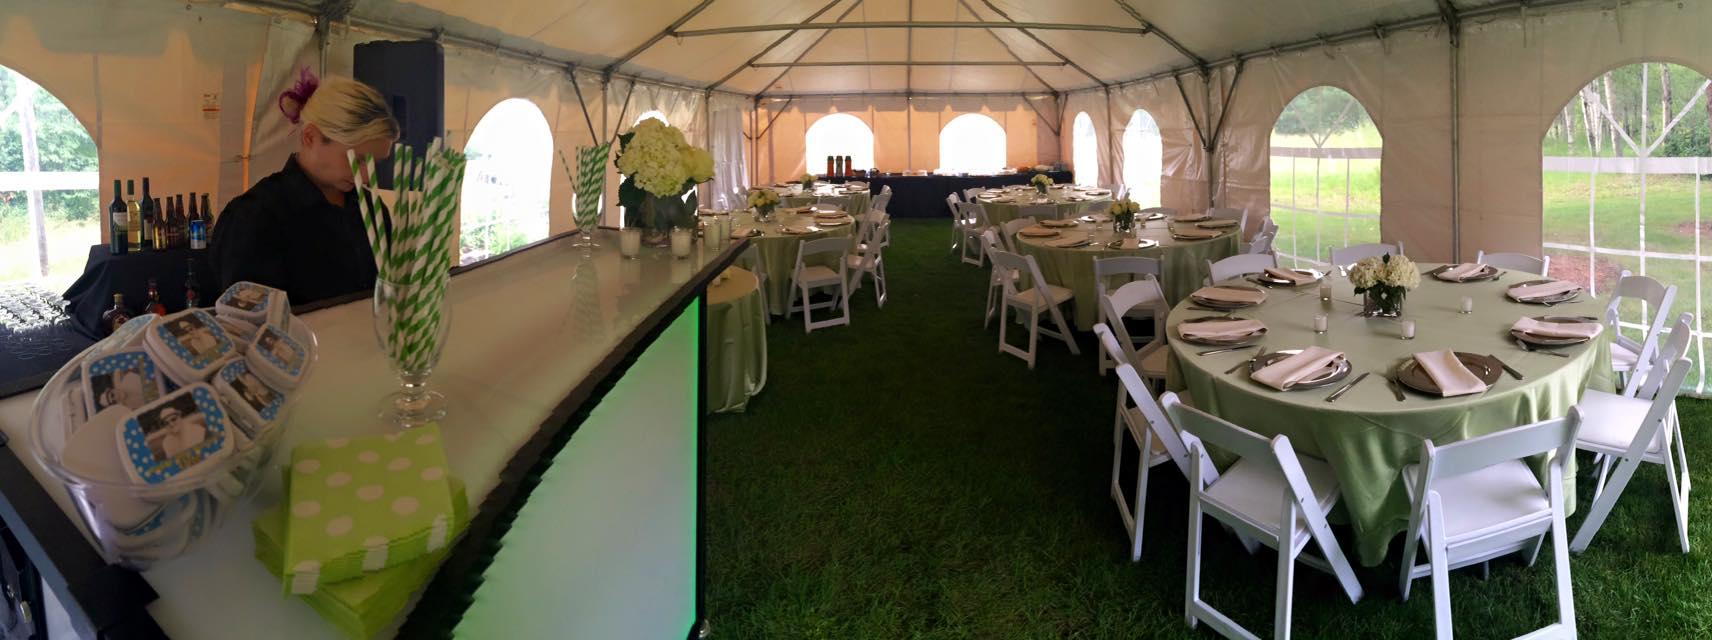 Tent Celebration